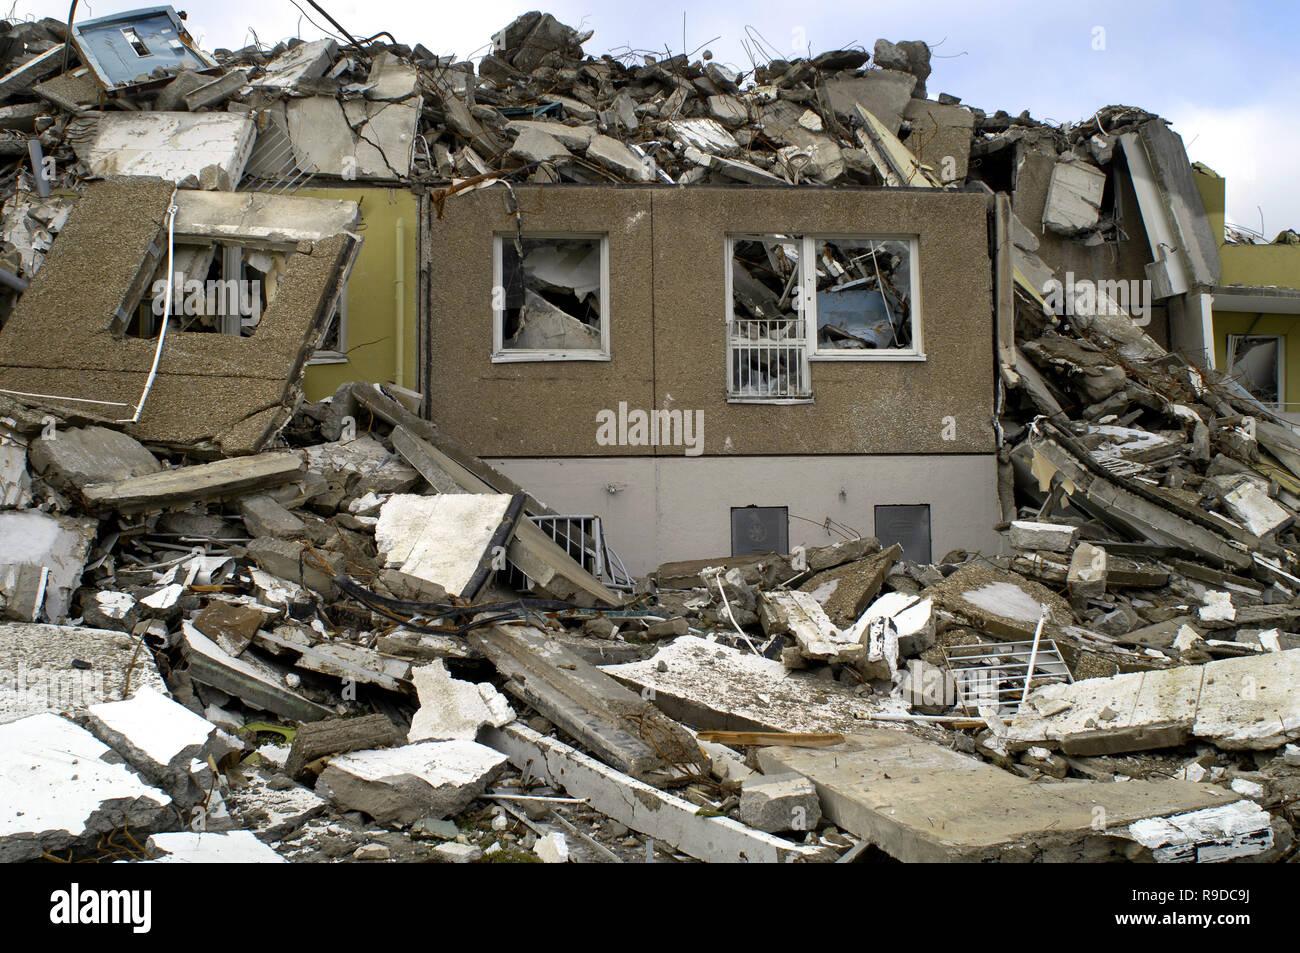 06.12.2005, Chemnitz, Saxony, Germany - Abriss eines Plattenbaus. 0UX051206D402CAROEX.JPG [MODEL RELEASE: NOT APPLICABLE, PROPERTY RELEASE: NO (c) car - Stock Image